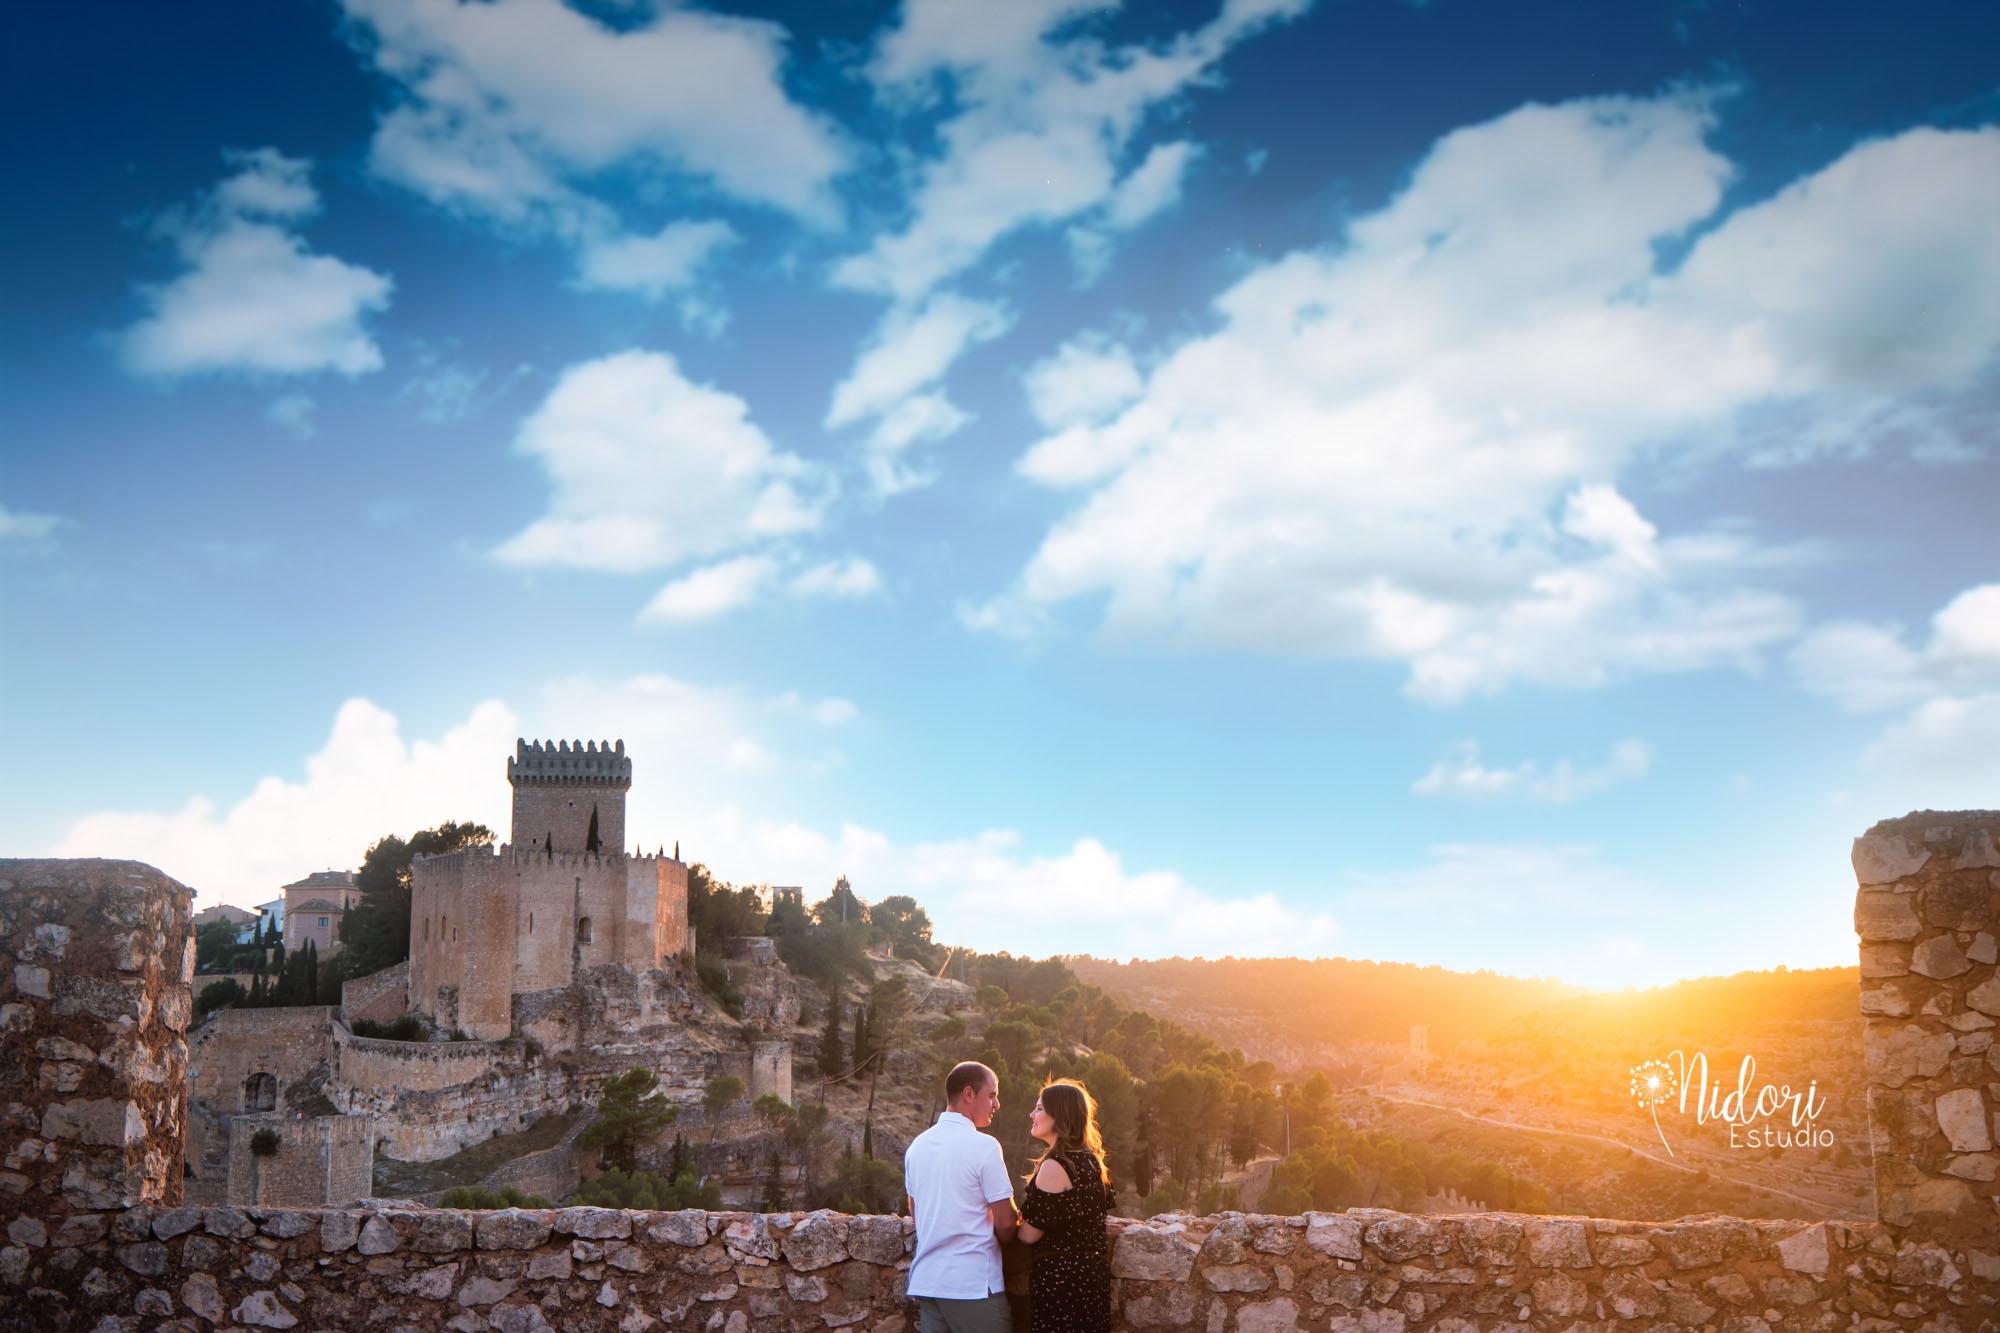 fotos-de-boda-reportaje-novios-fotografia-boda-nidoriestudio-fotos-valencia-almazora-castellon-españa-spain-018